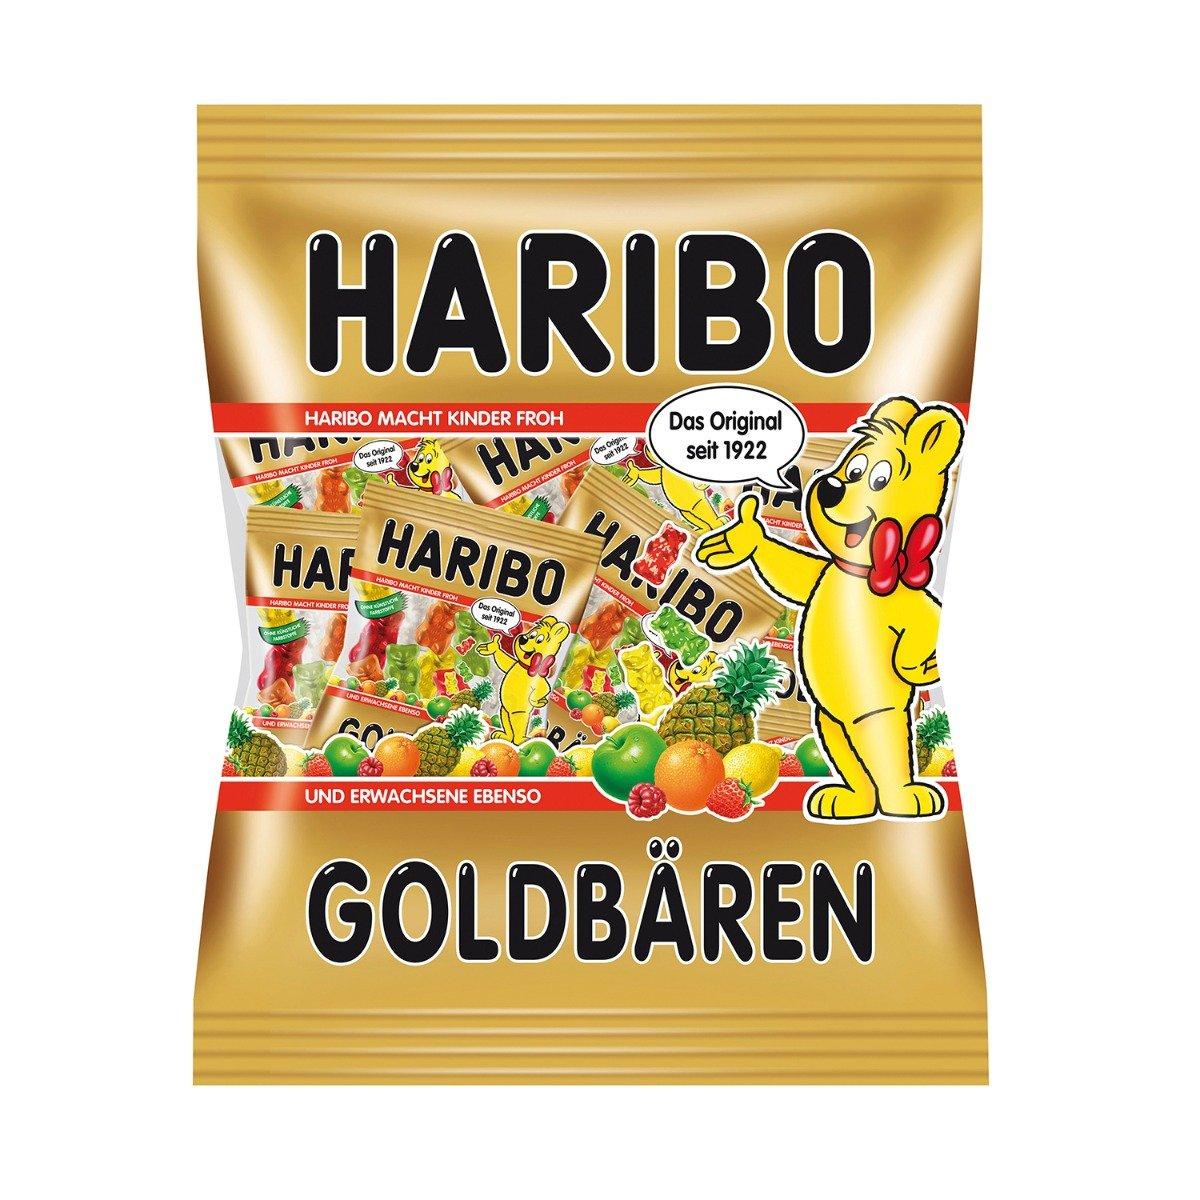 Jeleuri Haribo Goldbears Minimaxi, 250 g imagine 2021